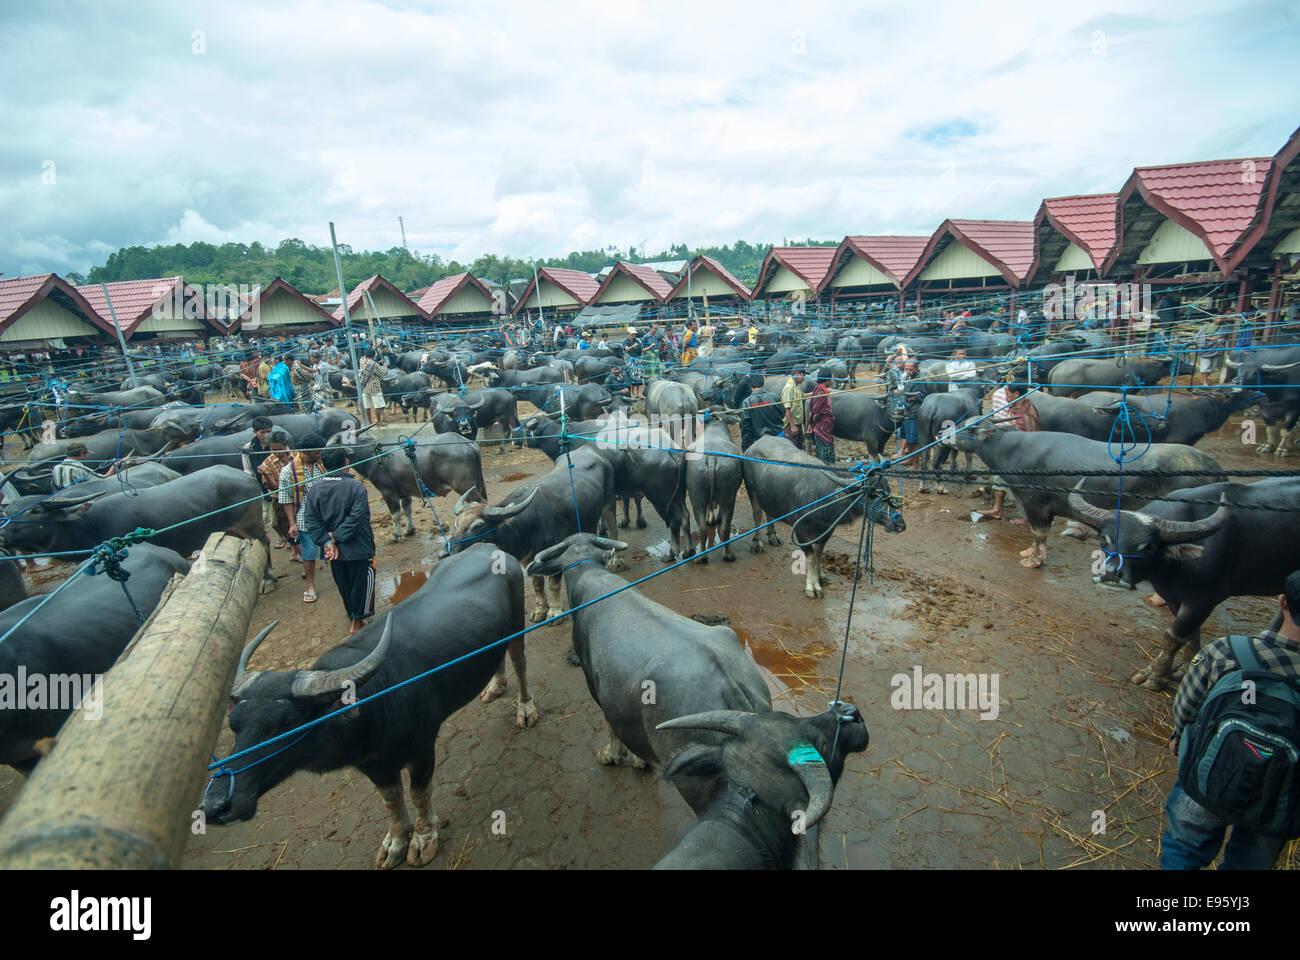 buffaloe and pig market in rantepao sulawesi indonesia - Stock Image